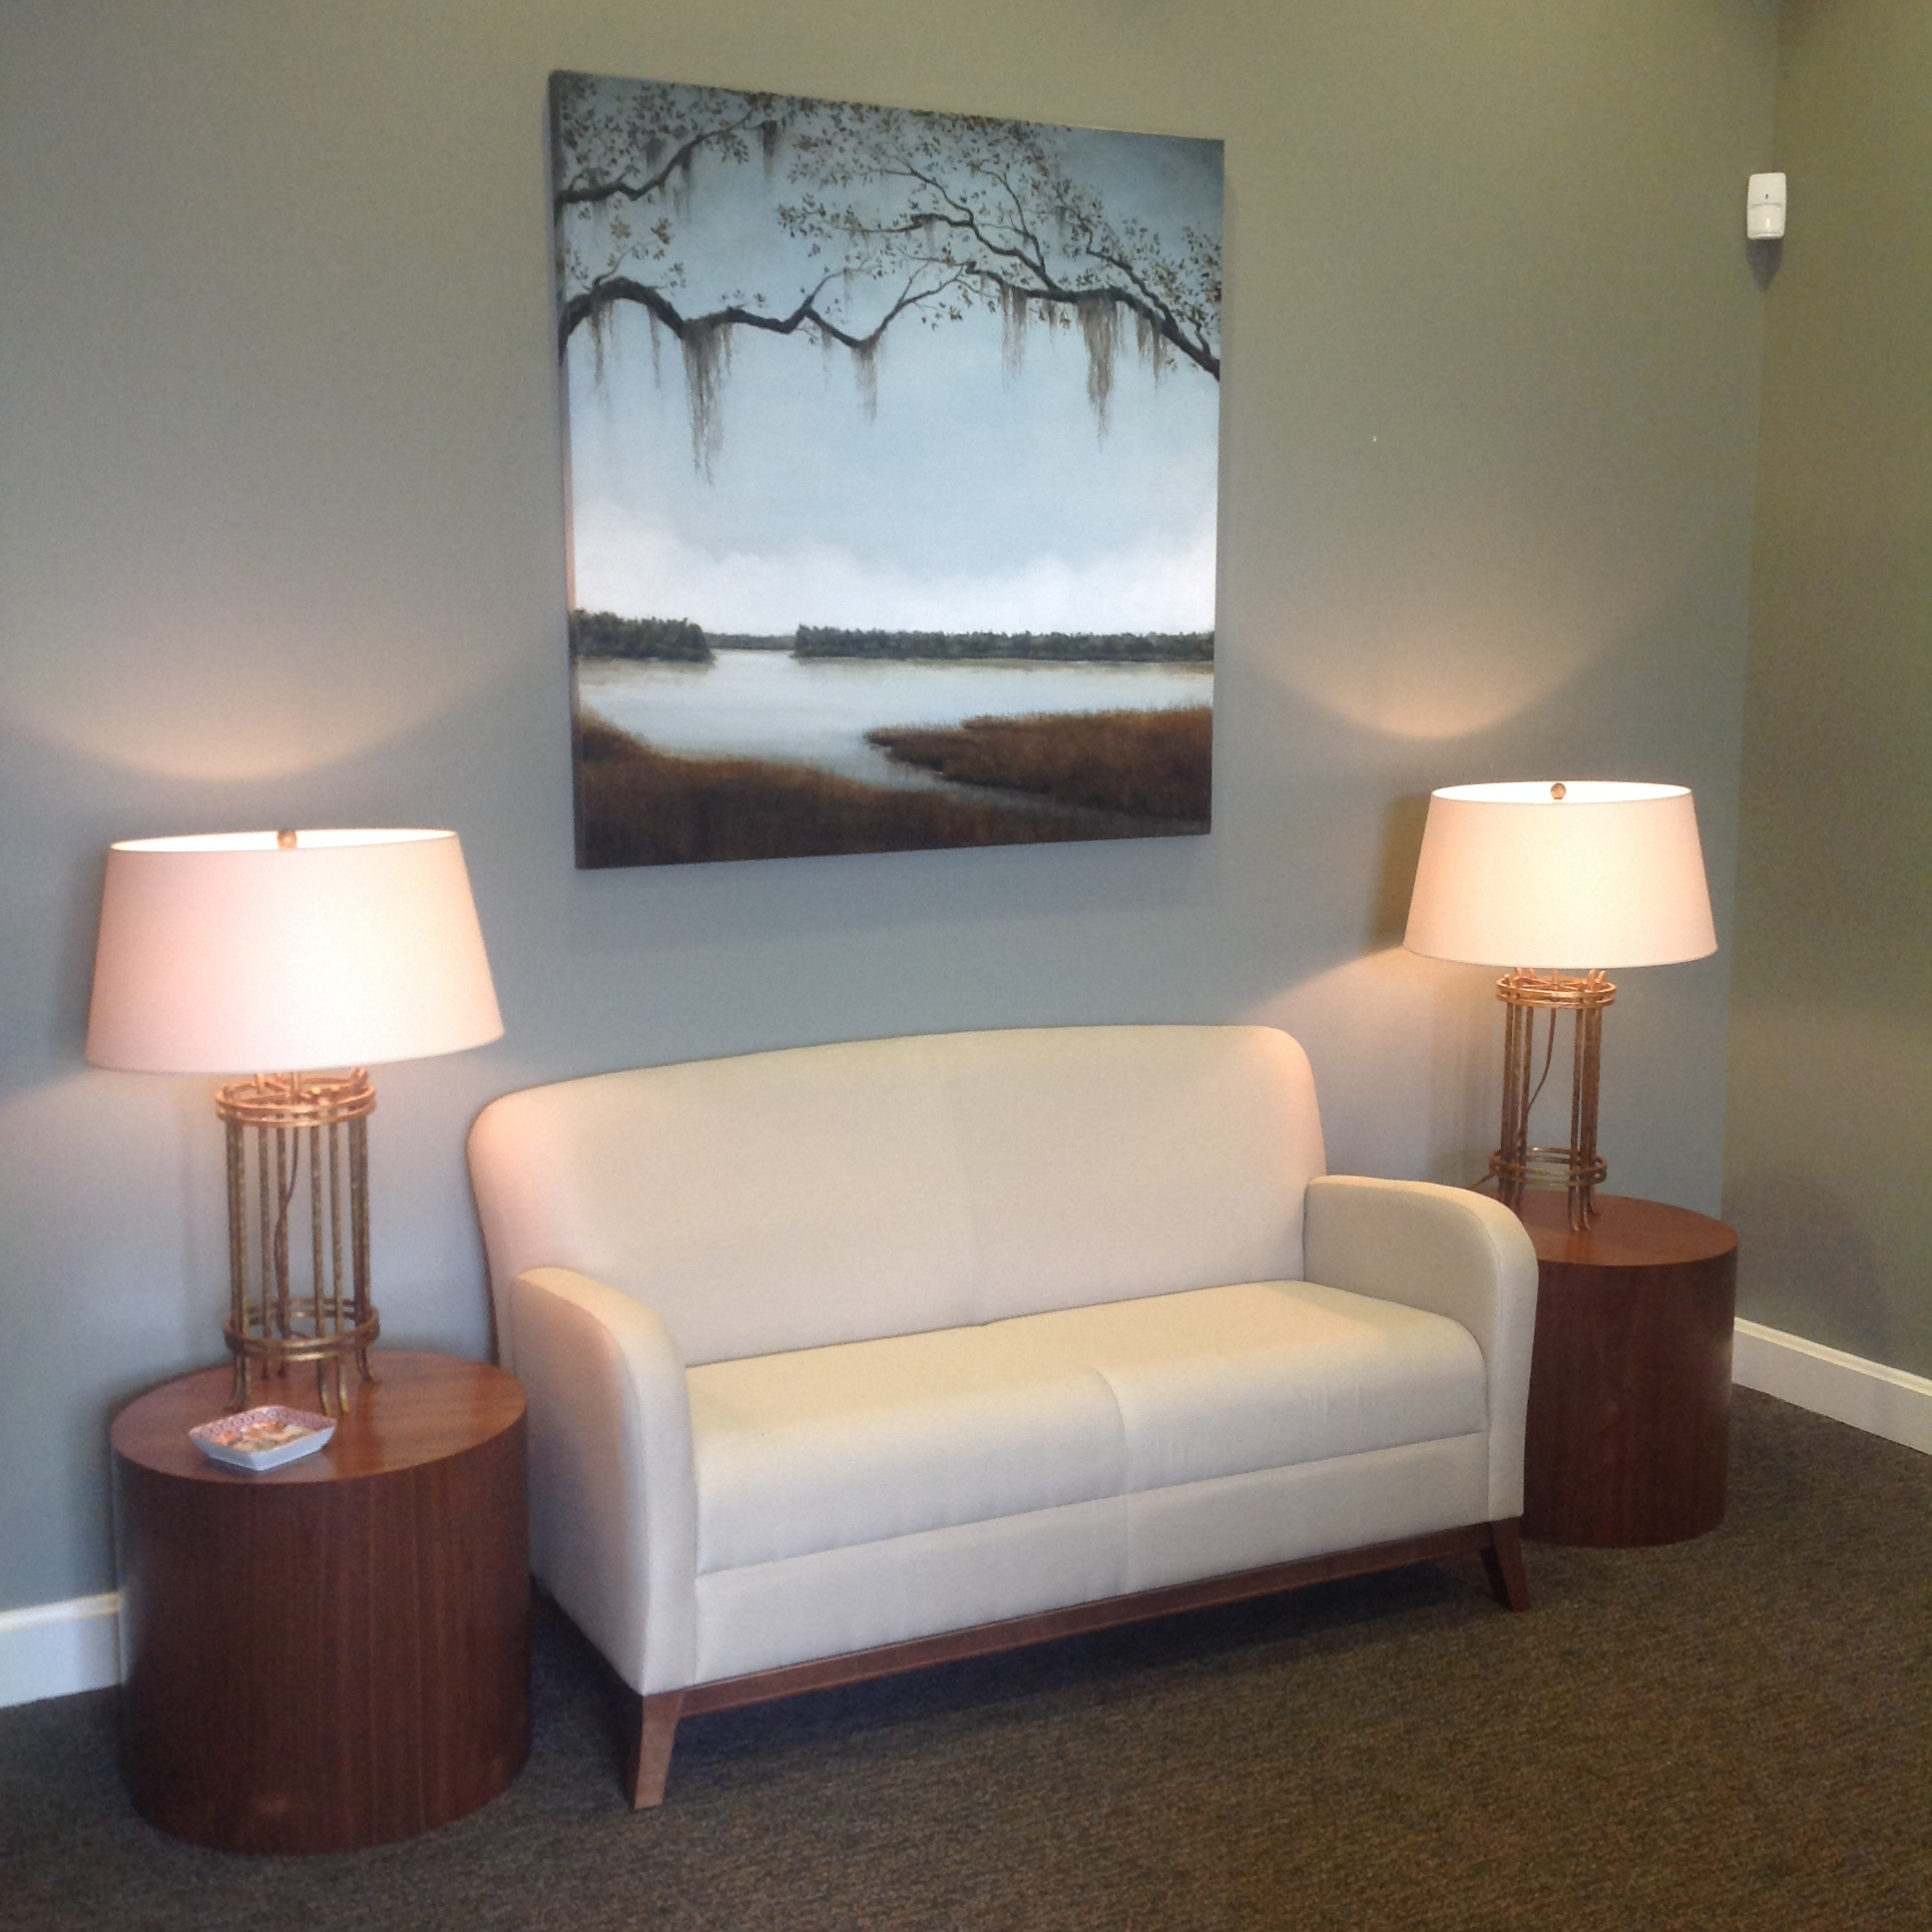 van kirk wealth management waiting room, gulfport, mississippi